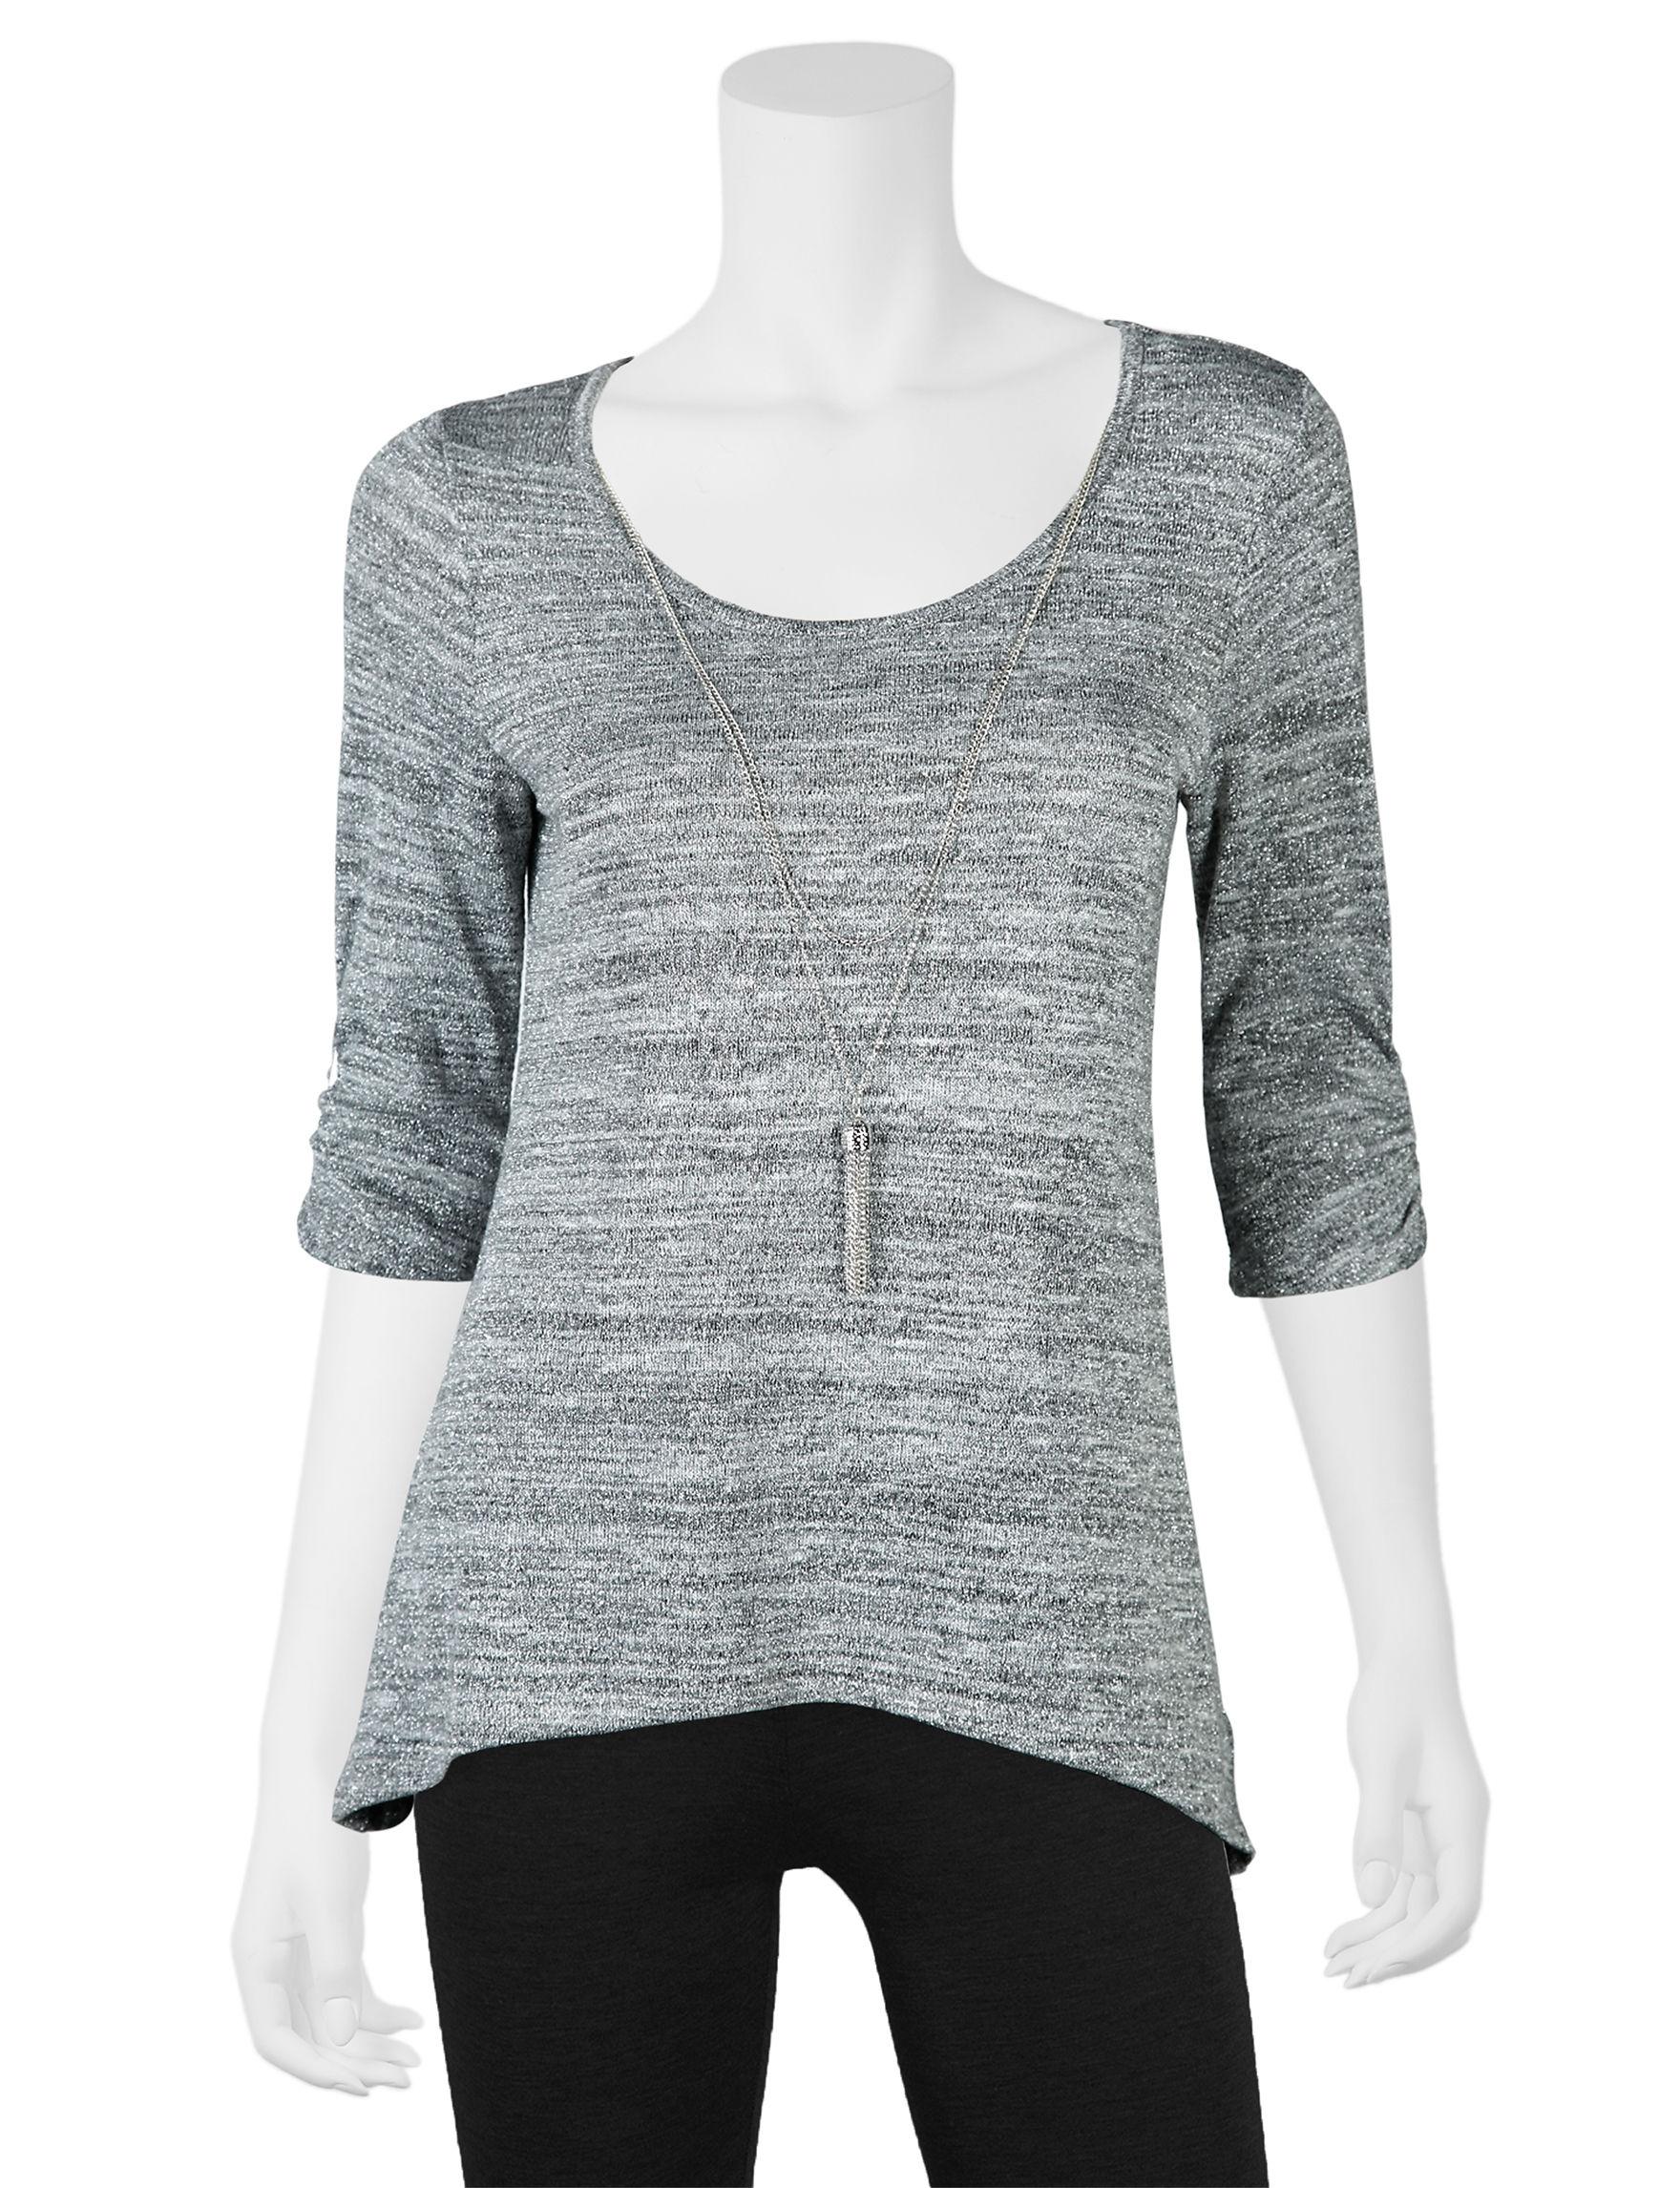 A. Byer Grey Shirts & Blouses